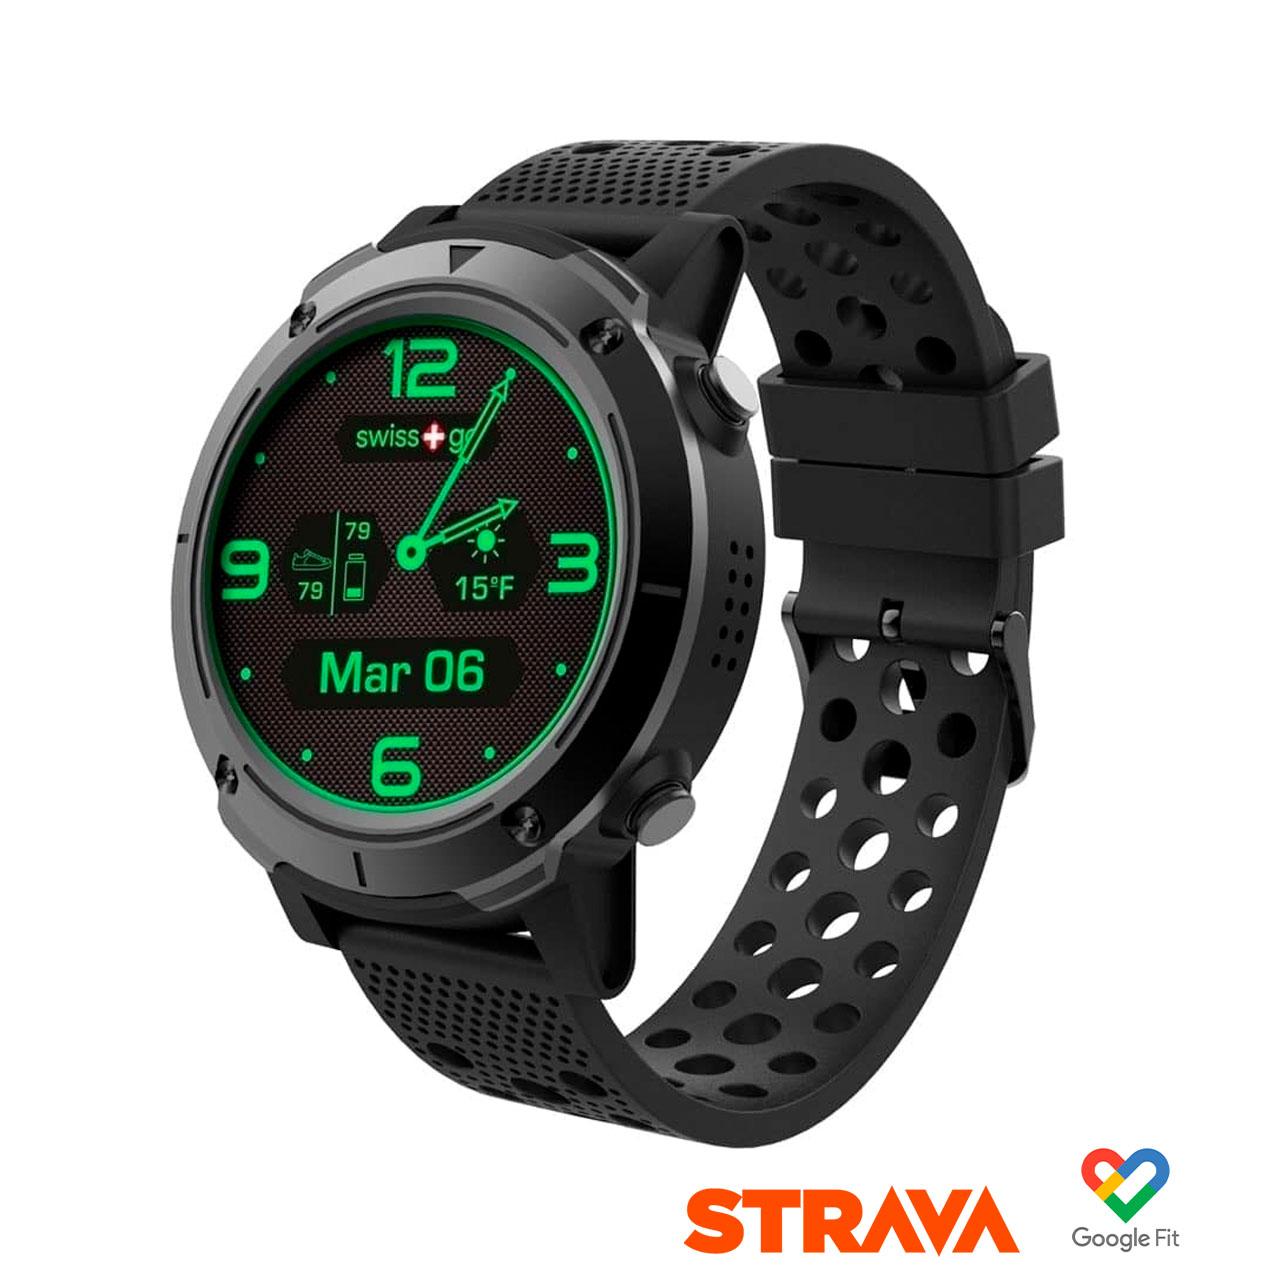 Swiss+Go Smart Watch Zermatt Pantalla IPS 1,3 pulg. Táctil, GPS